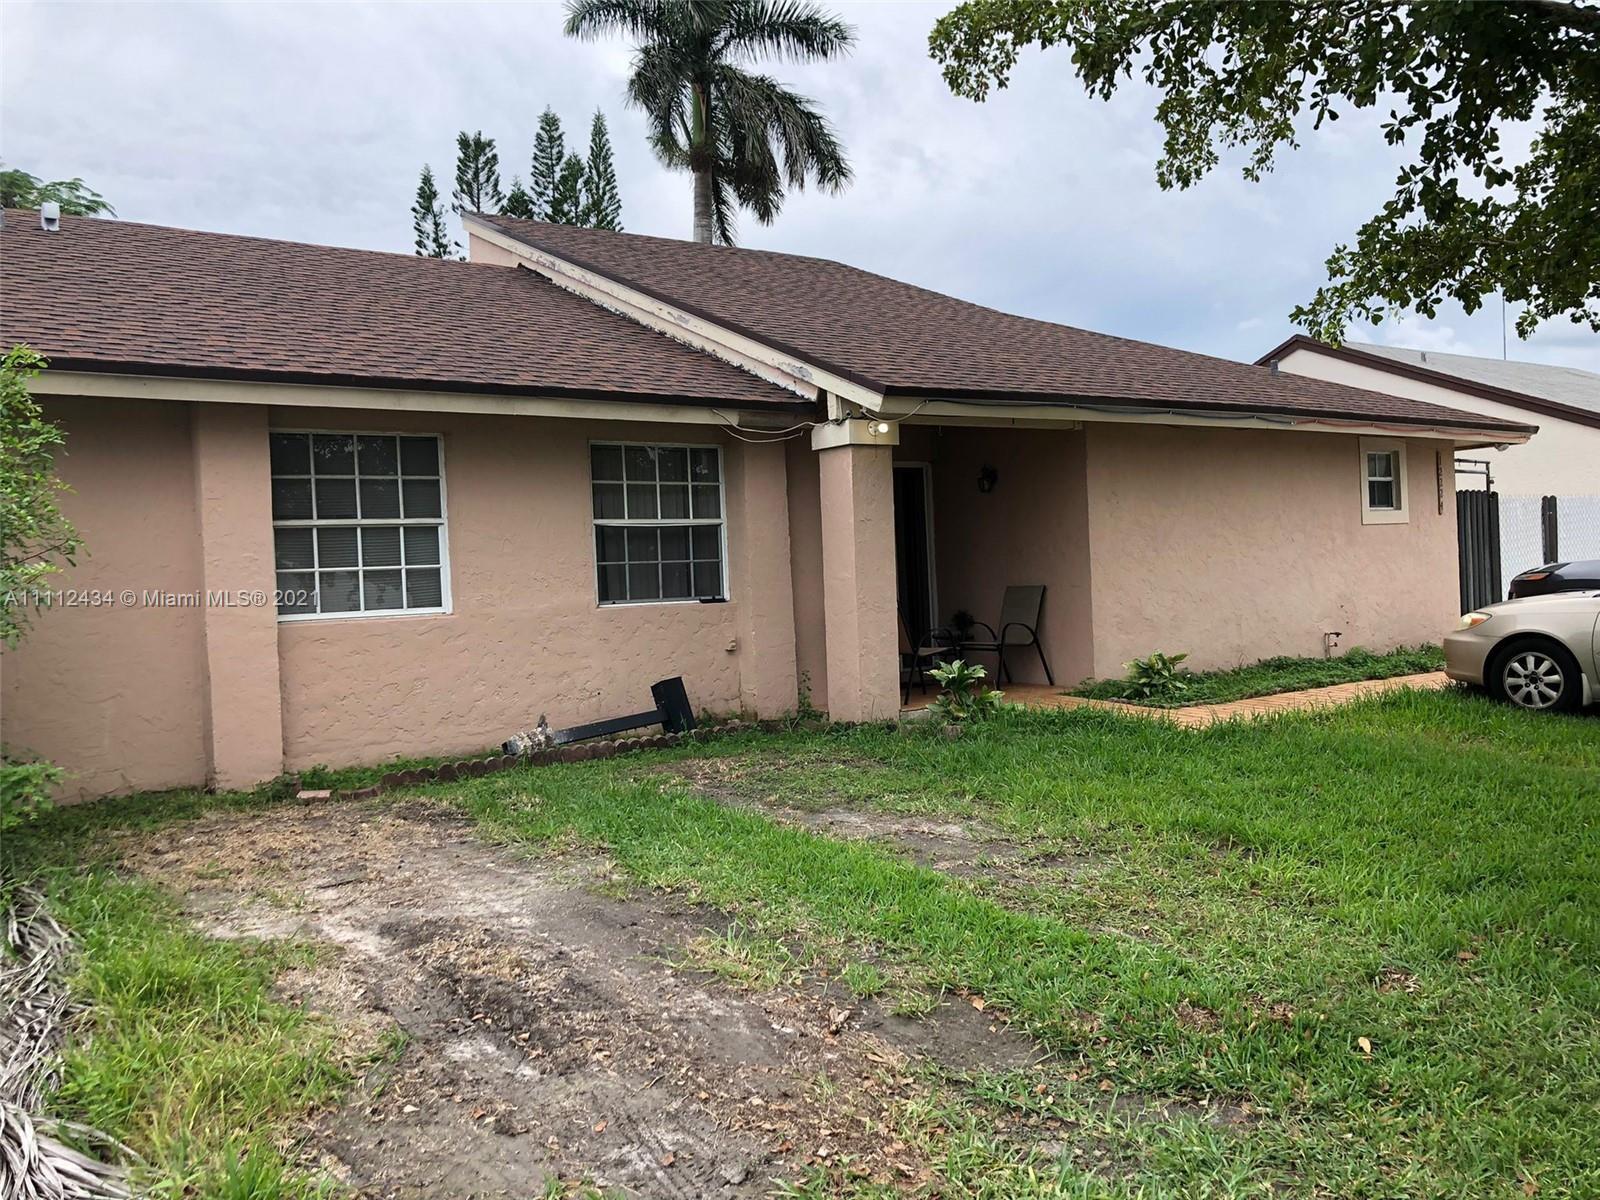 Single Family Home,For Sale,12224 SW 210th St, Miami, Florida 33177,Brickell,realty,broker,condos near me